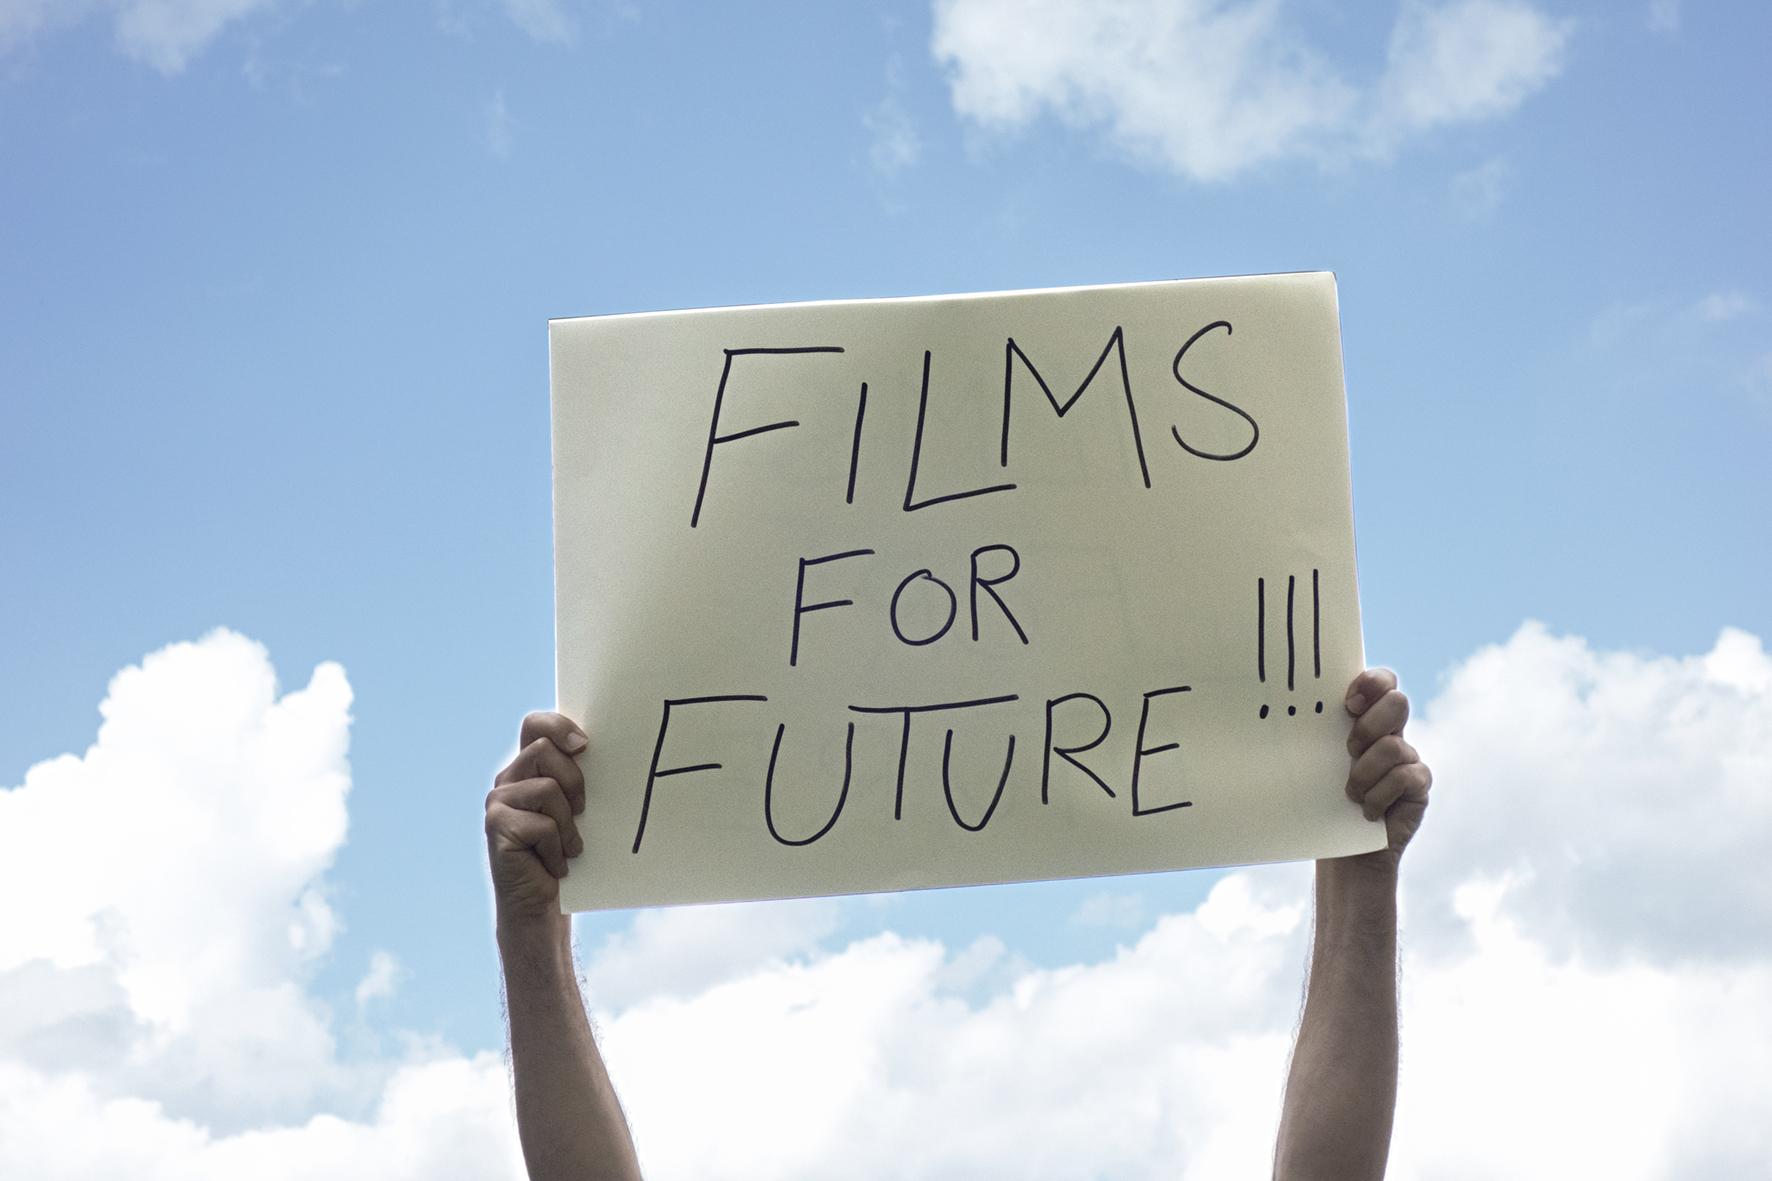 Filmcamp for Future